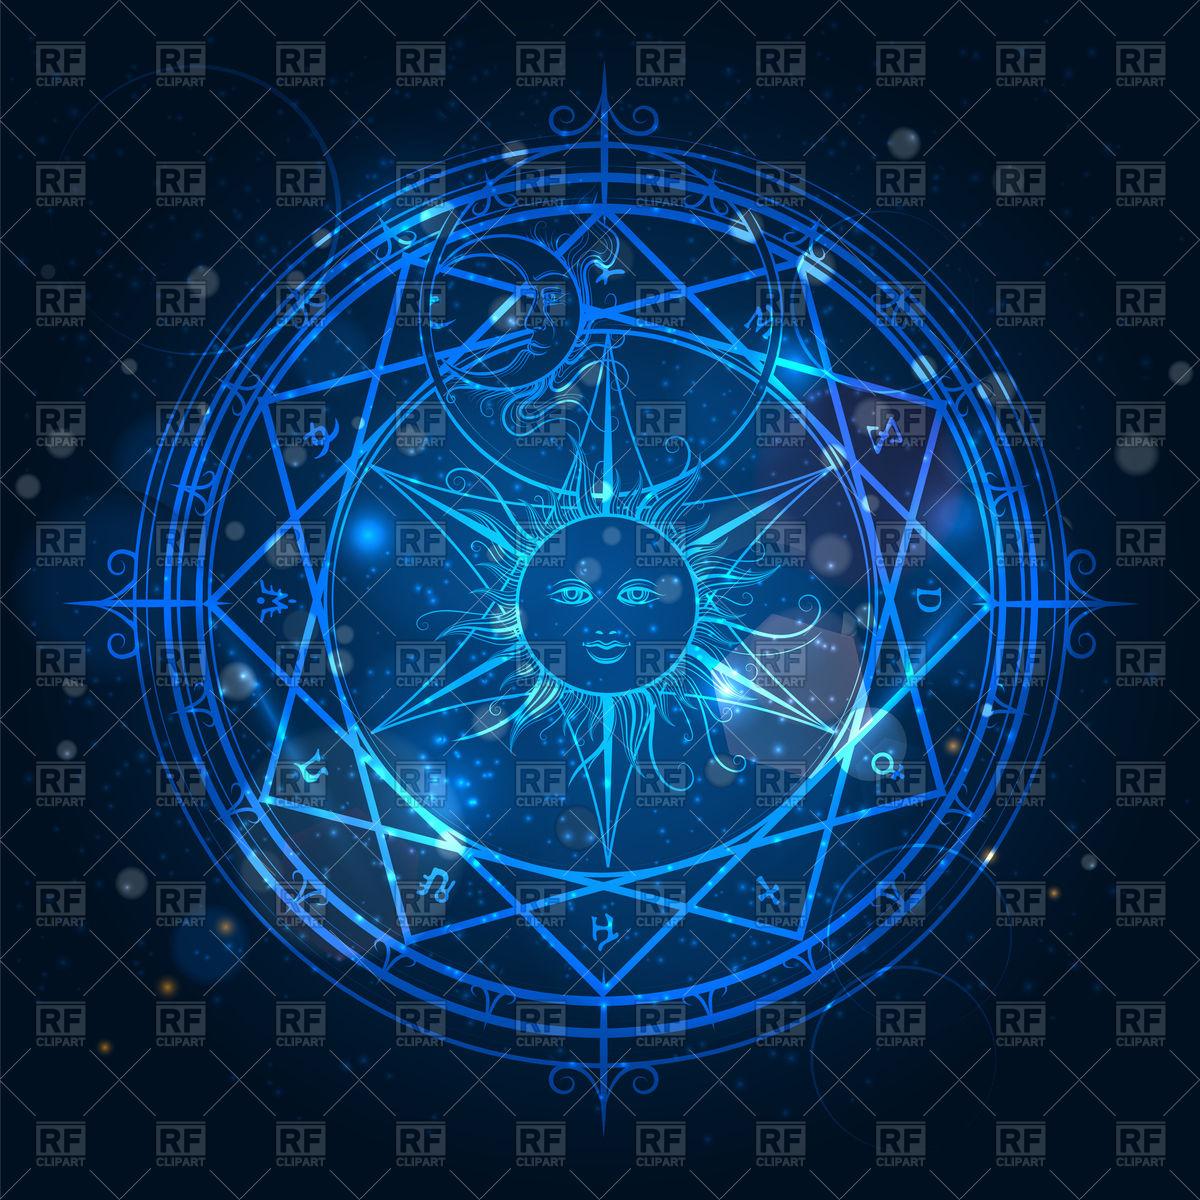 Alchemy magic circle on shining blue background Vector Image of 1200x1200